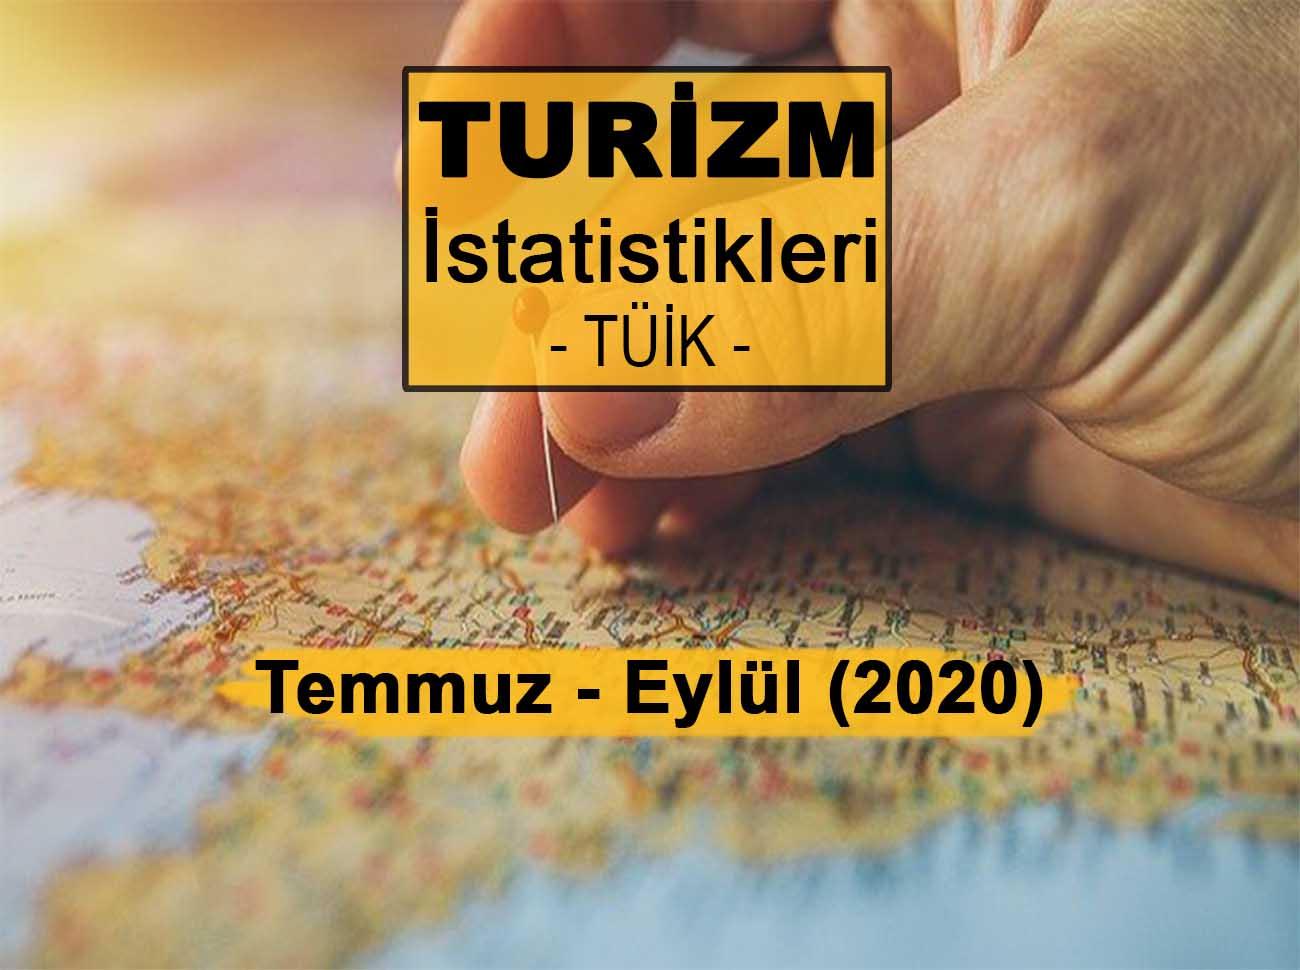 Turizm İstatistikleri (Temmuz – Eylül 2020)